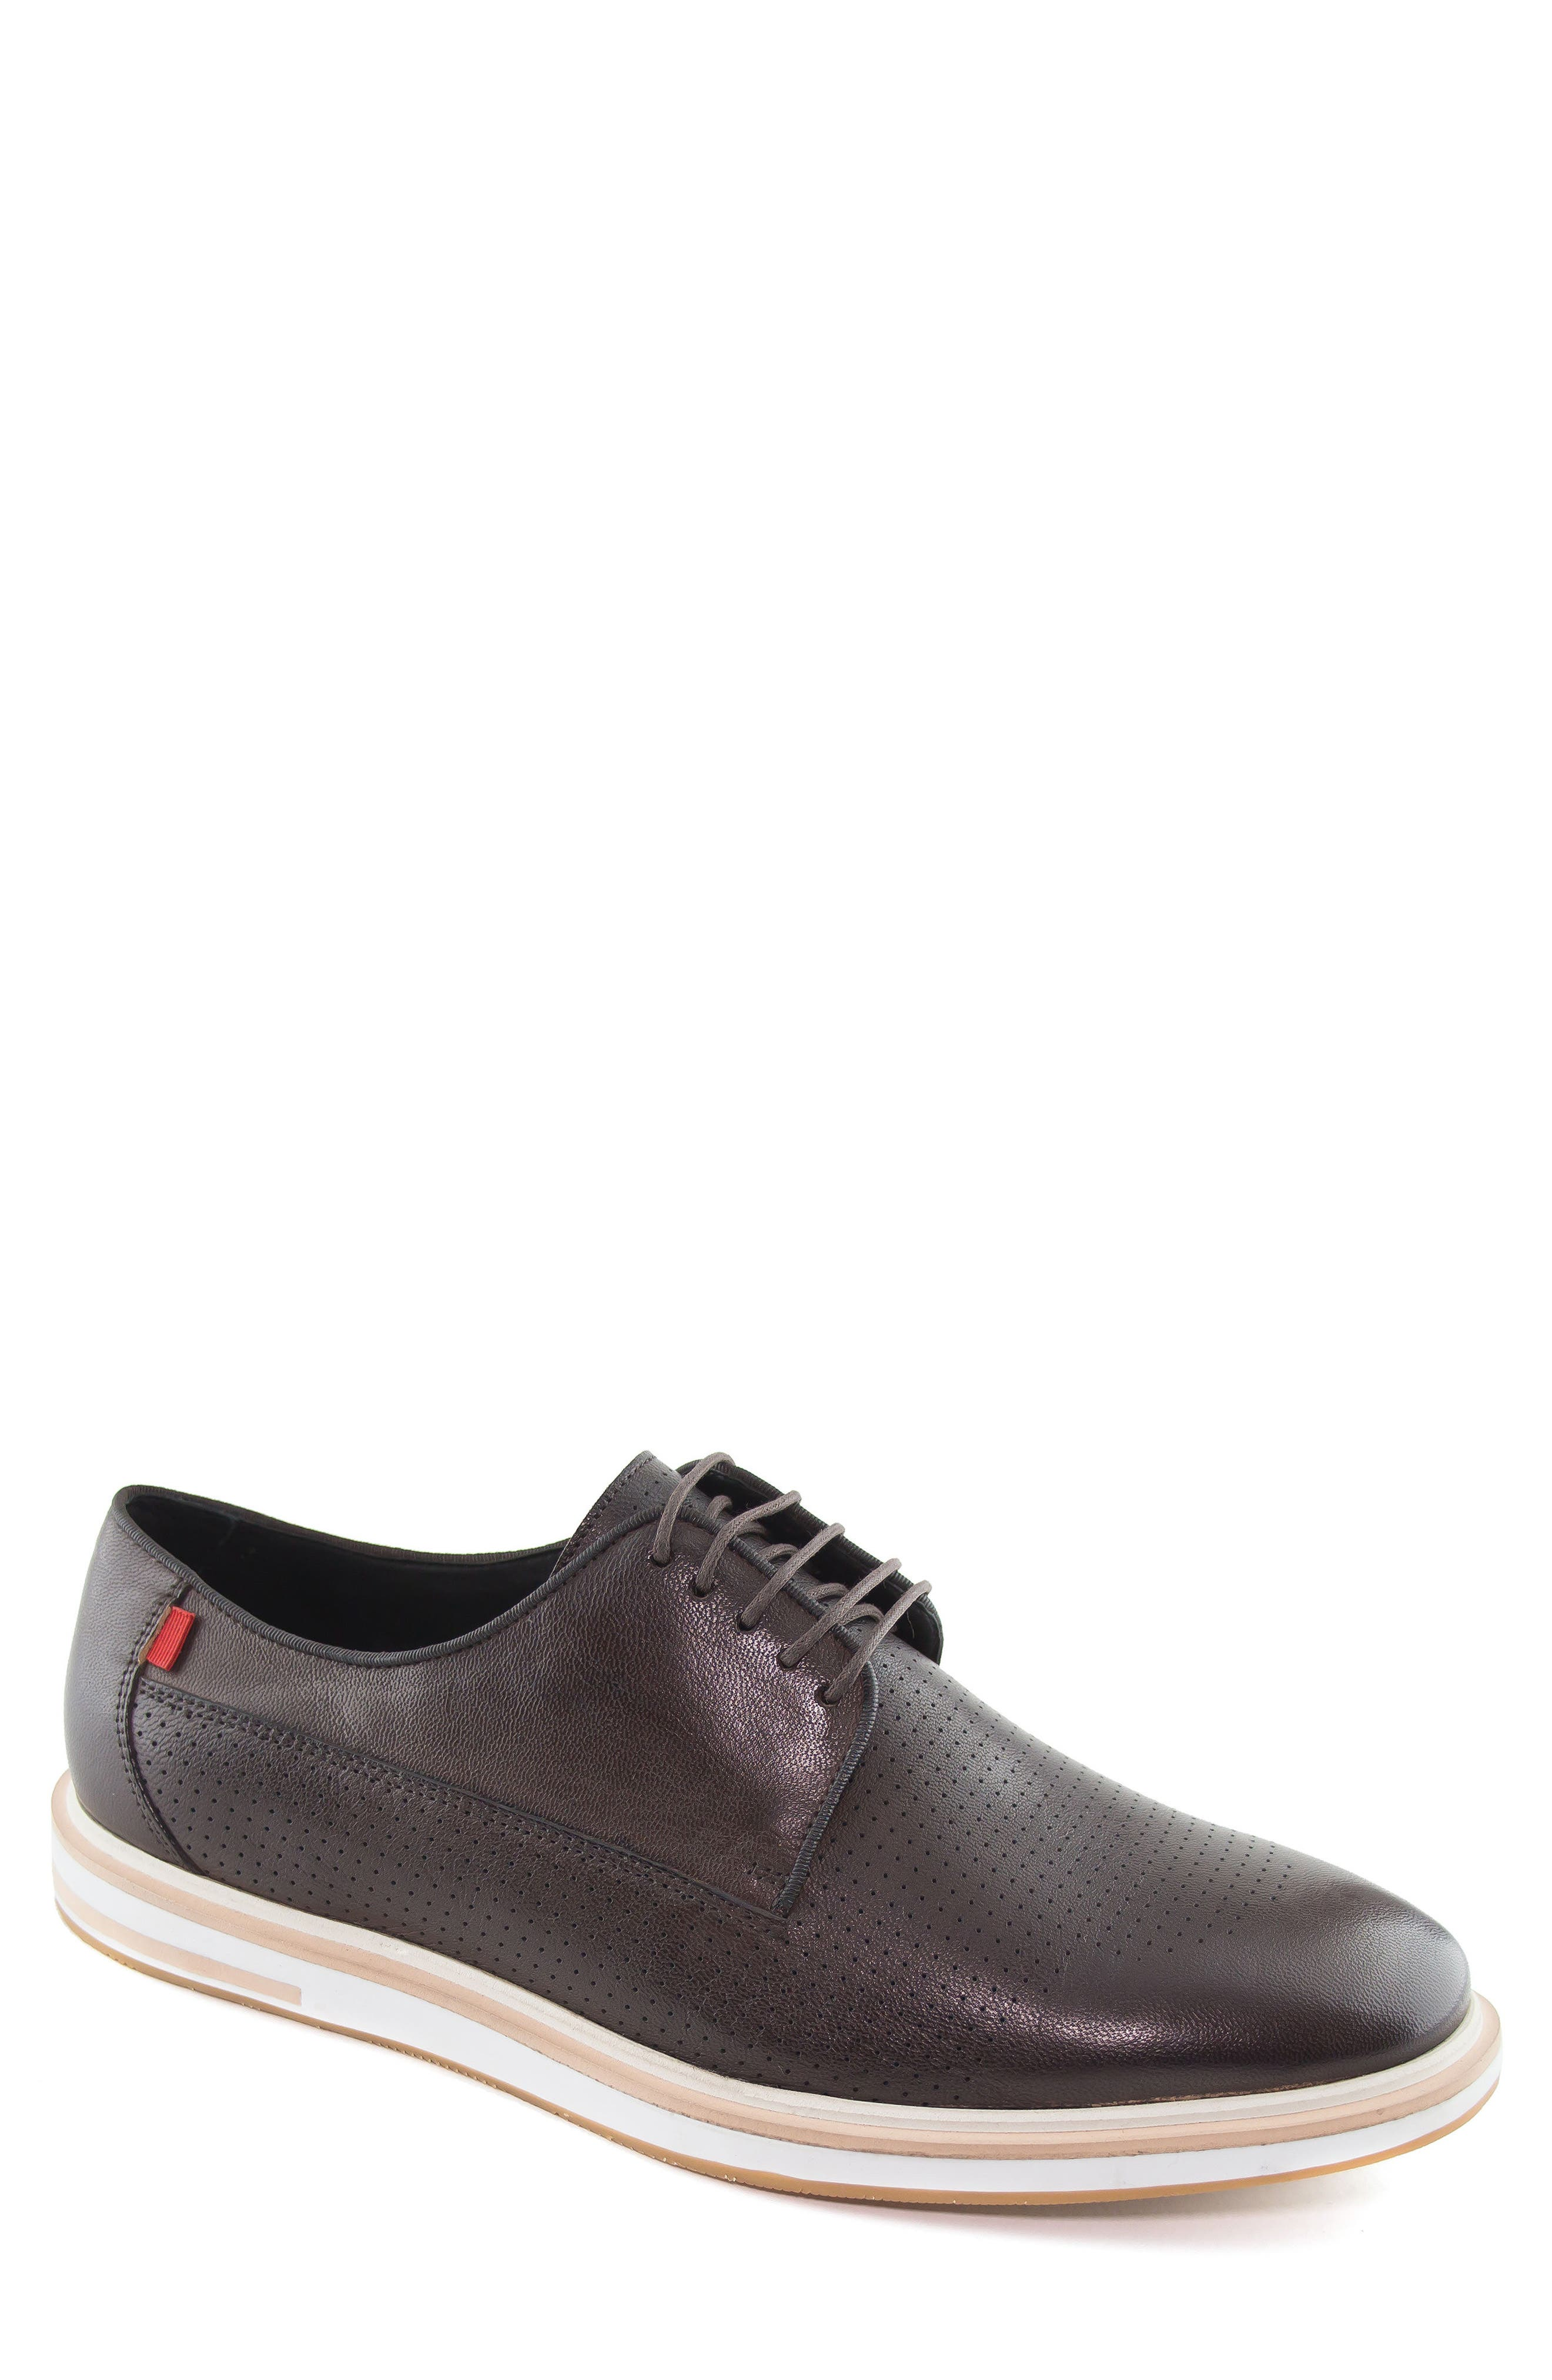 MARC JOSEPH NEW YORK Manhattan Sneaker, Main, color, 205